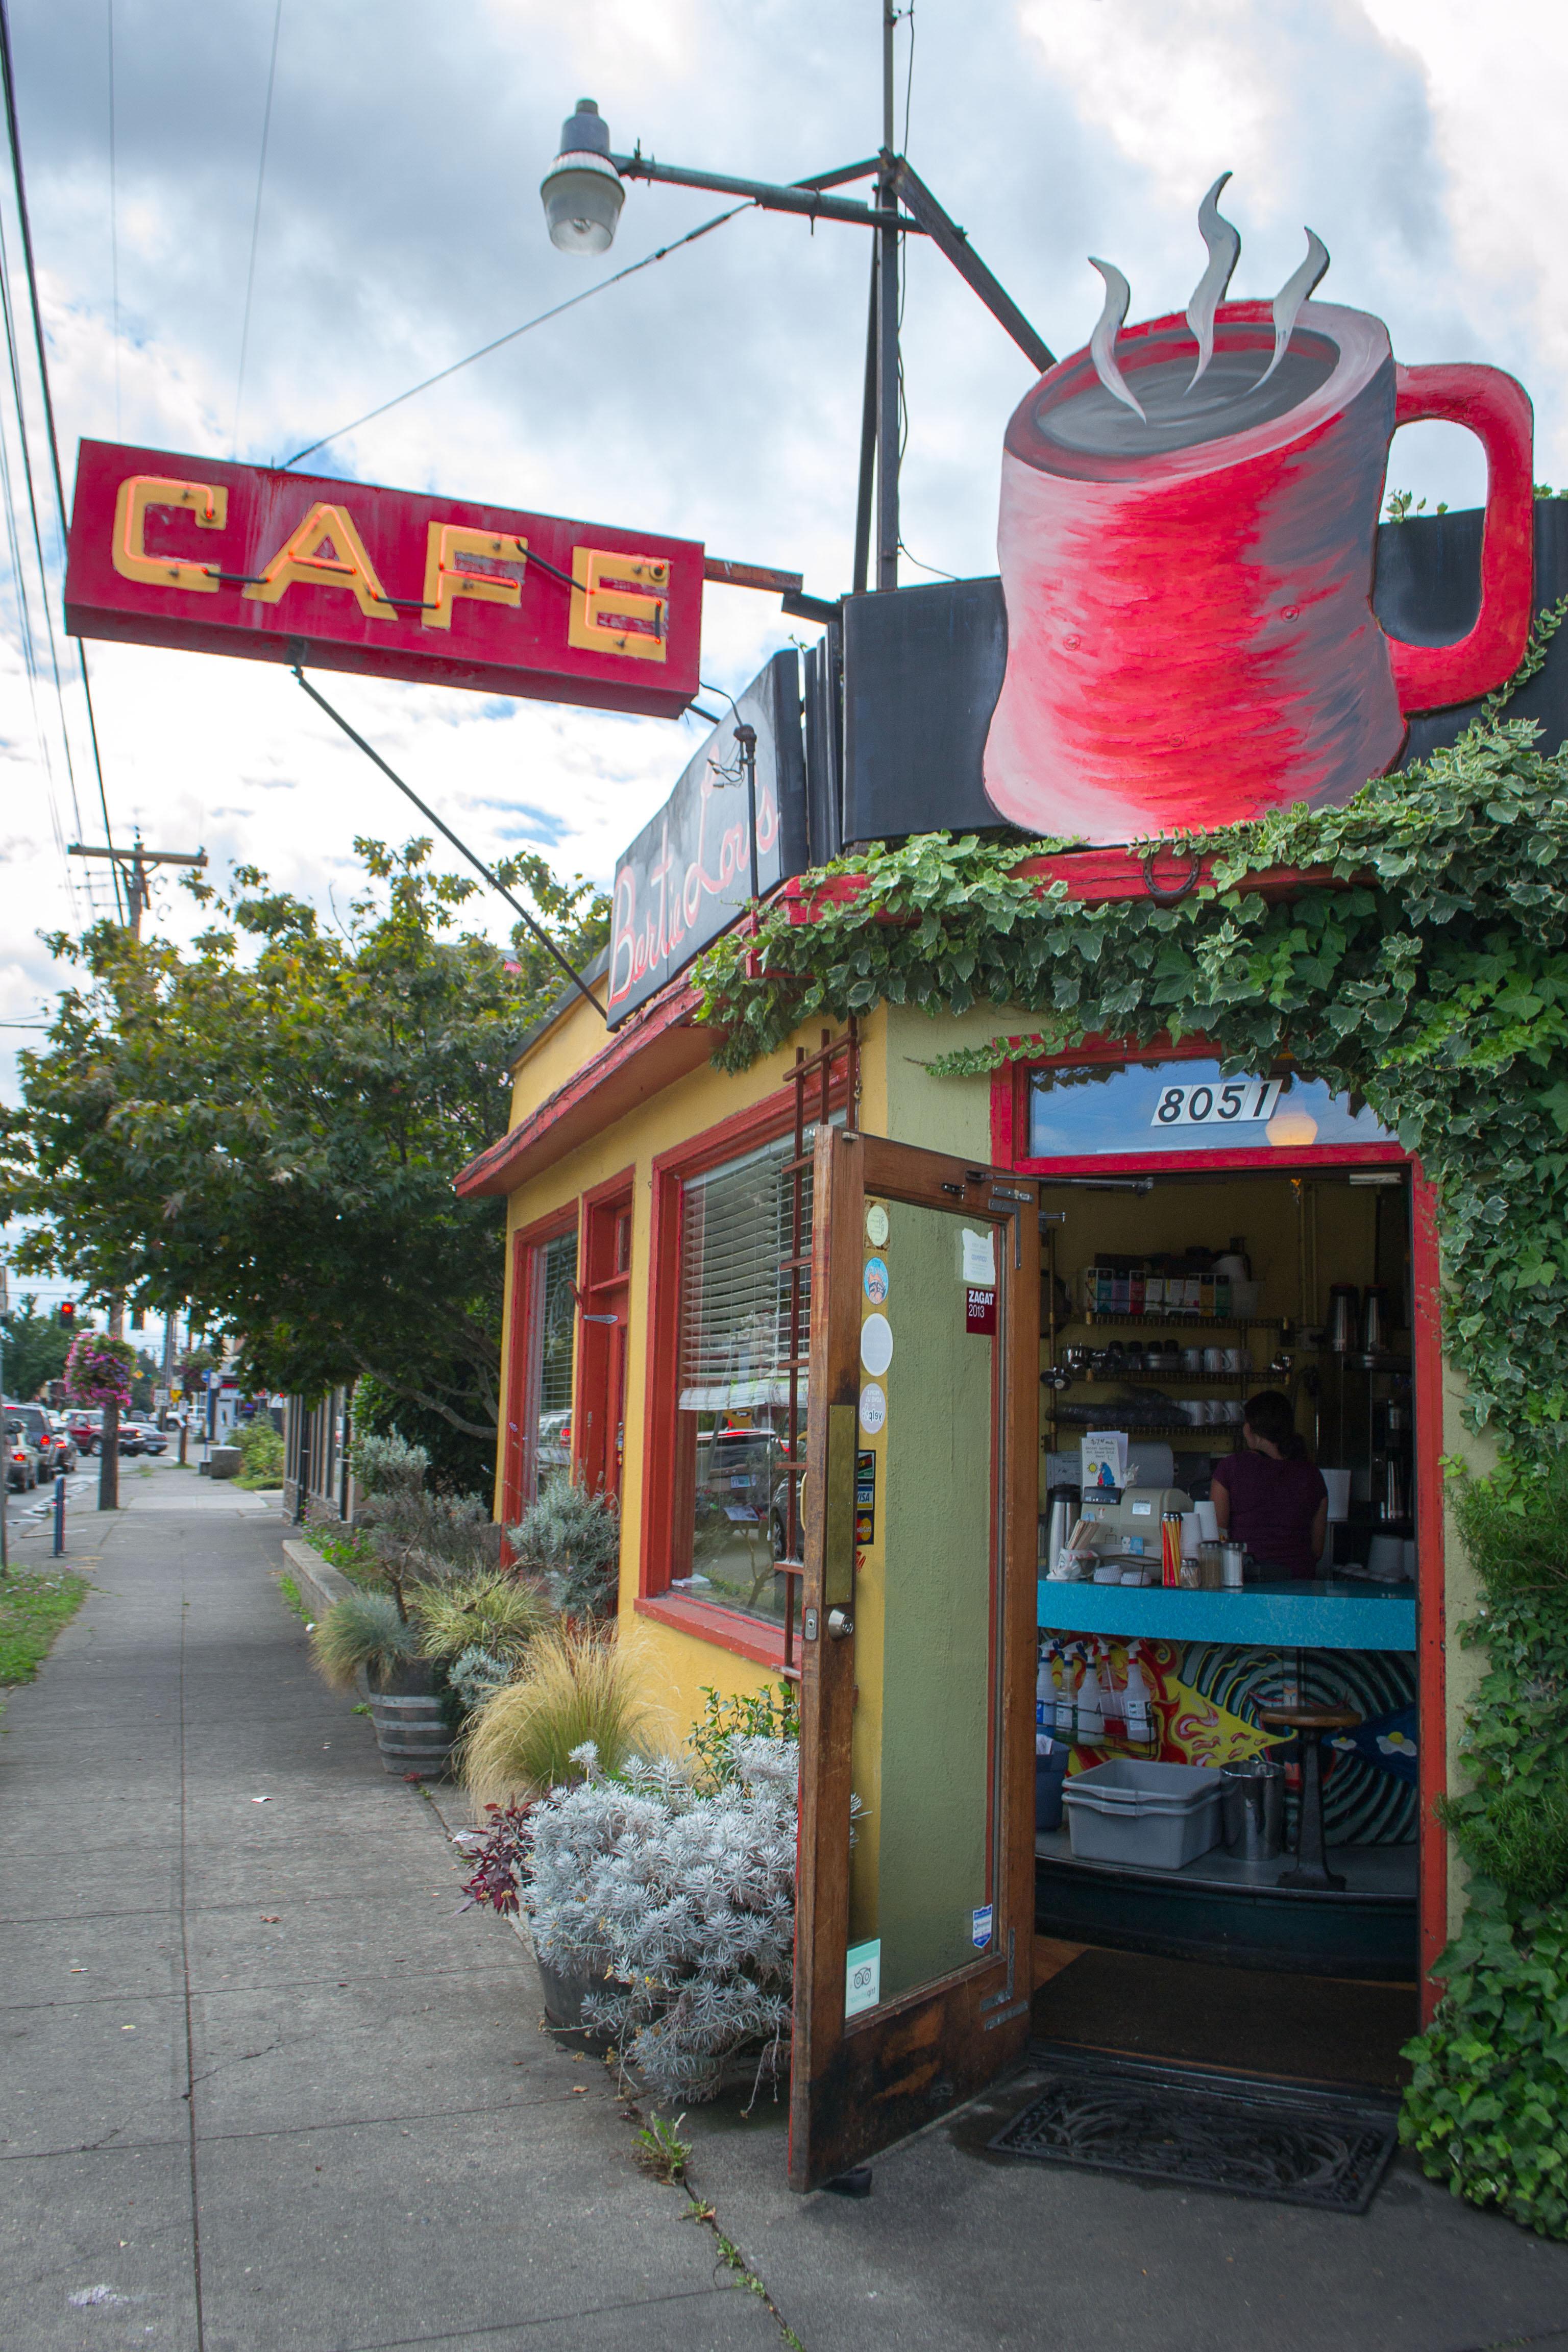 Image: A neighborhood cafe.